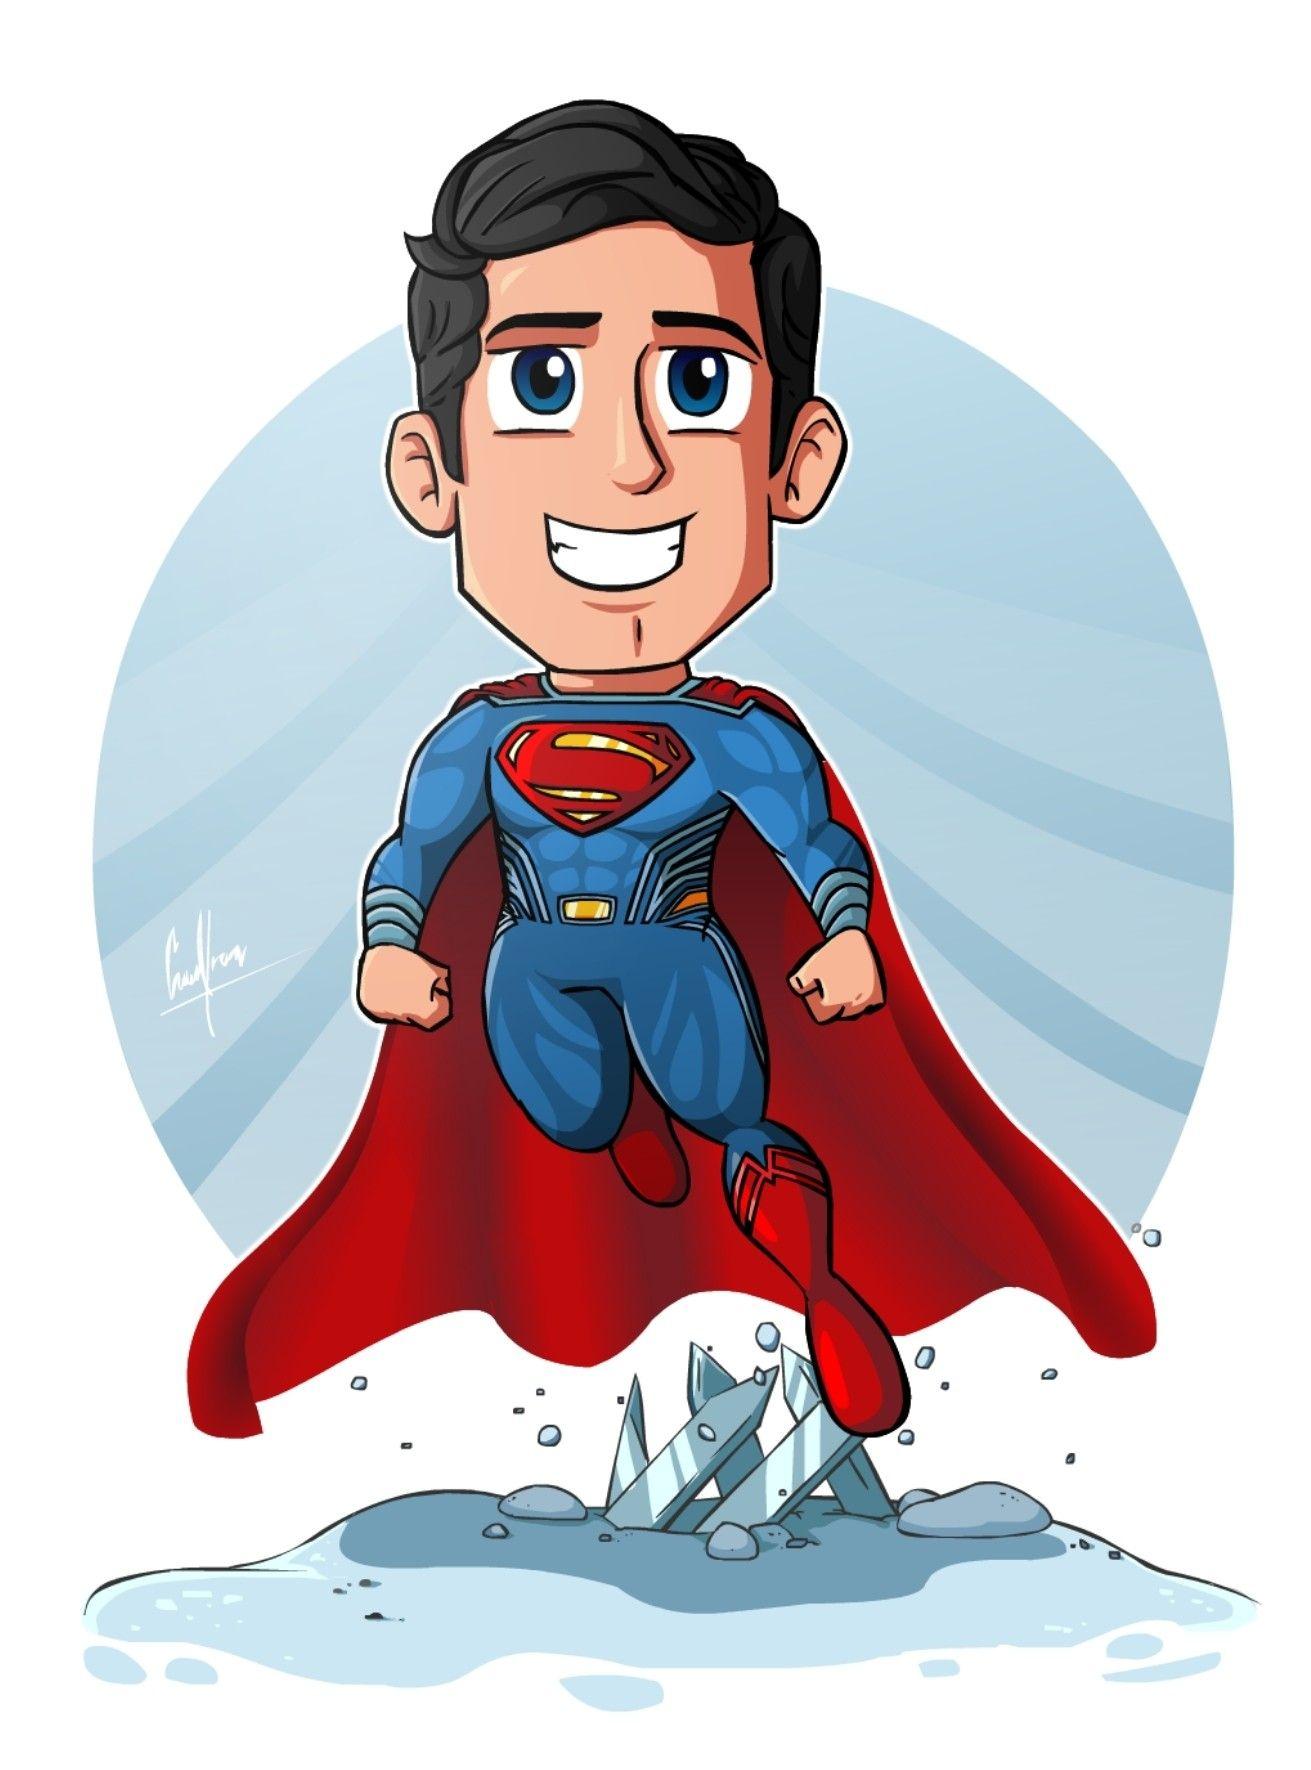 Pin By Adams Molina On Heroes Superman Man Of Steel Superman